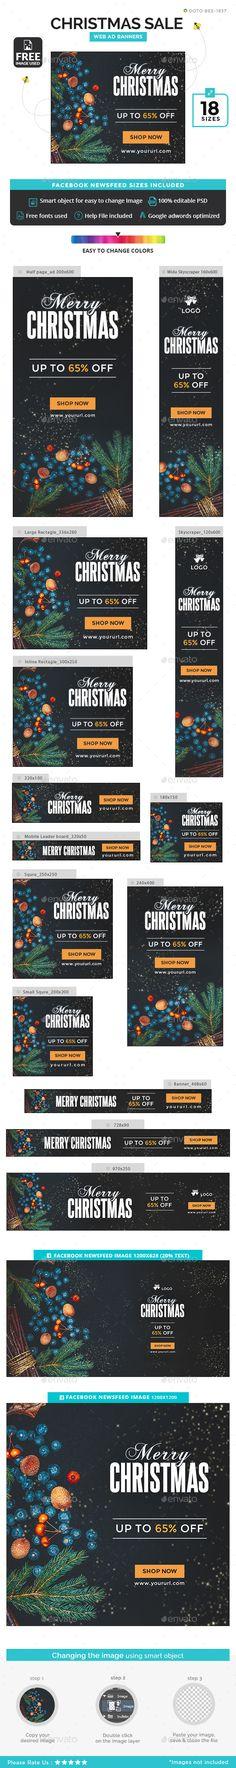 Christmas Sale Banners Template PSD #xmas #ads